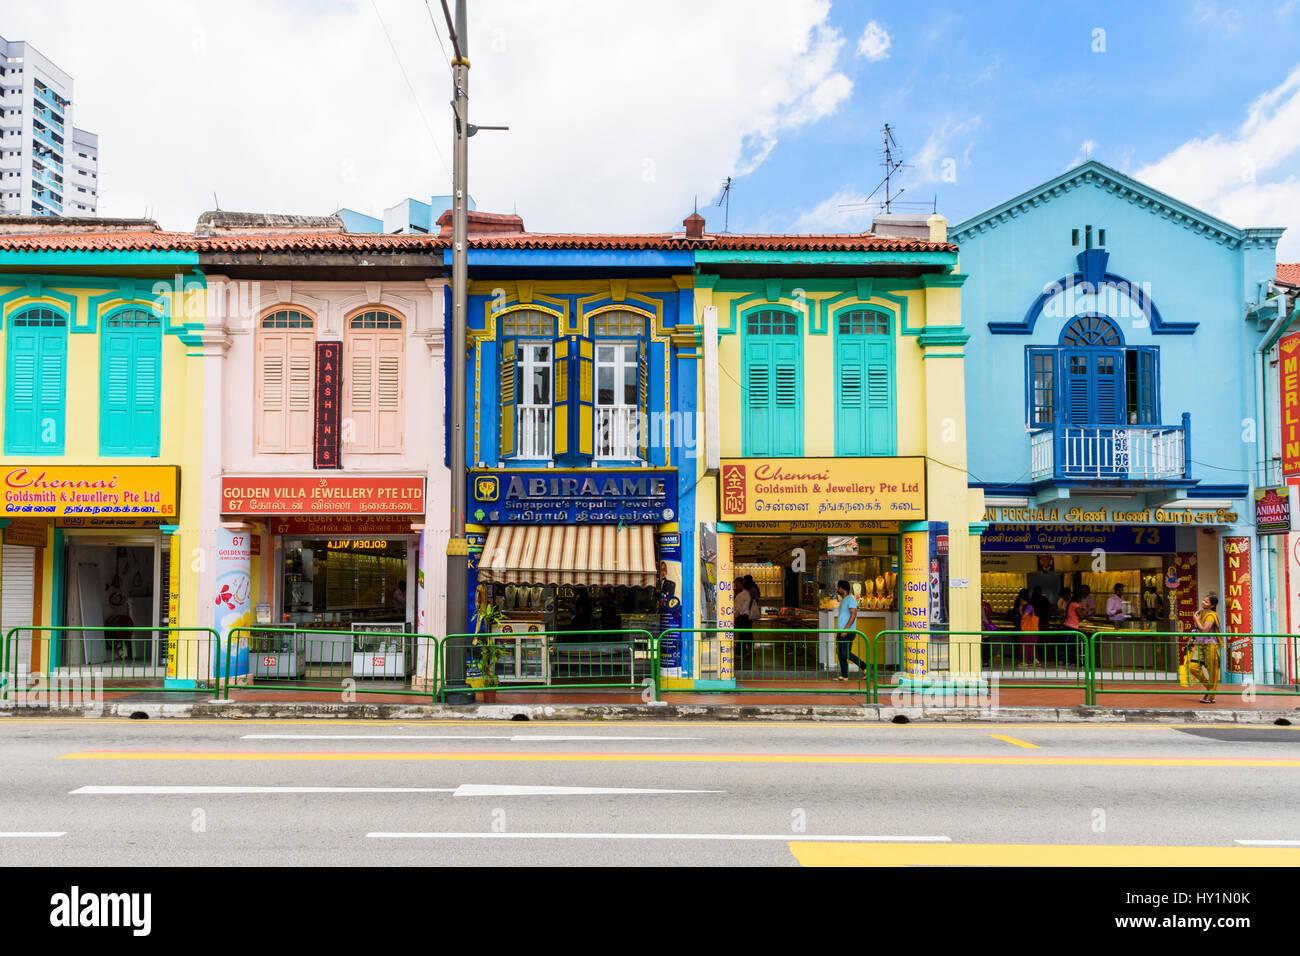 Colourful shophouses along Serangoon Rd, Little India, Singapore - Stock Image